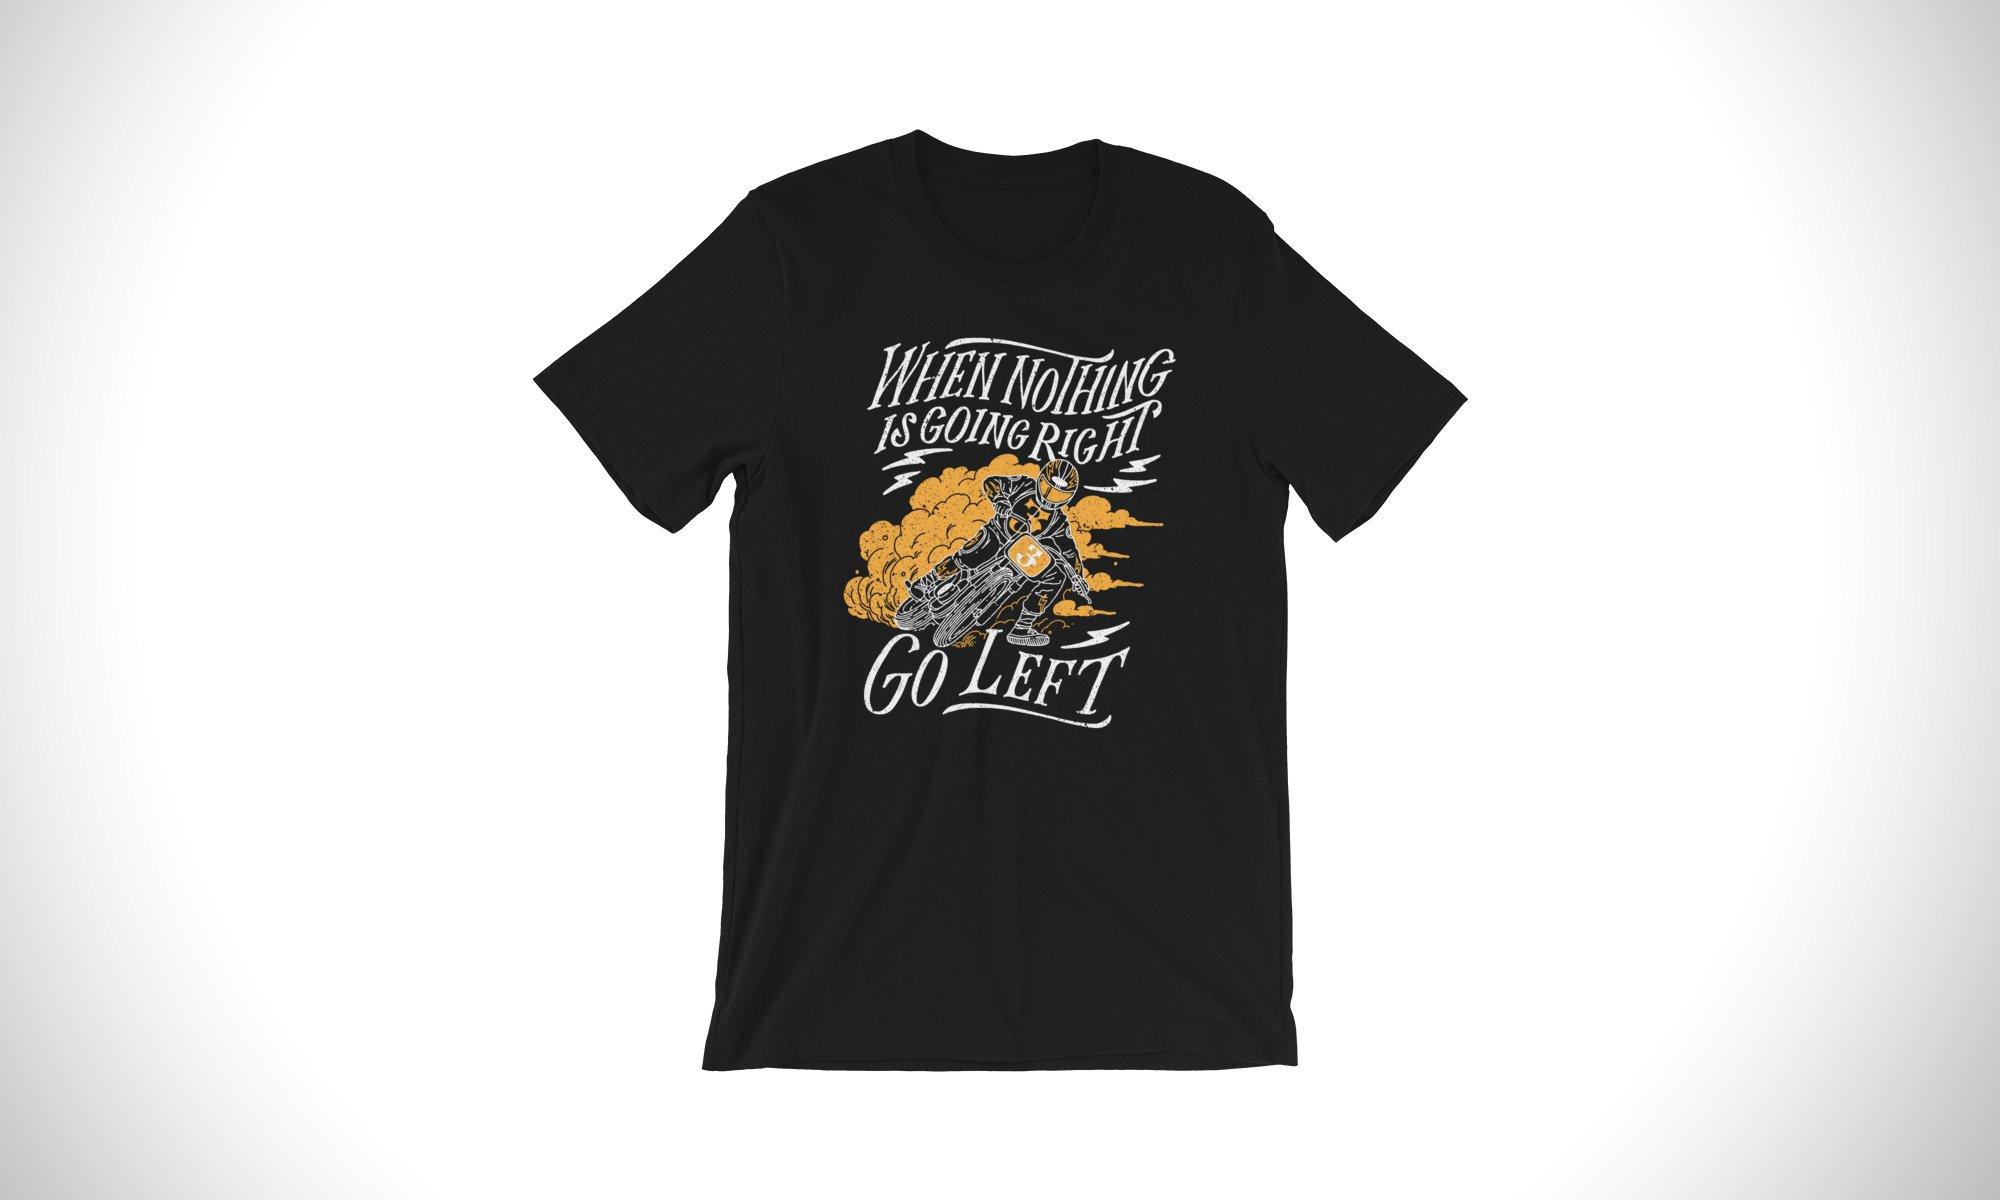 Go Left Tee - A Flat Tracker T-Shirt From Australia